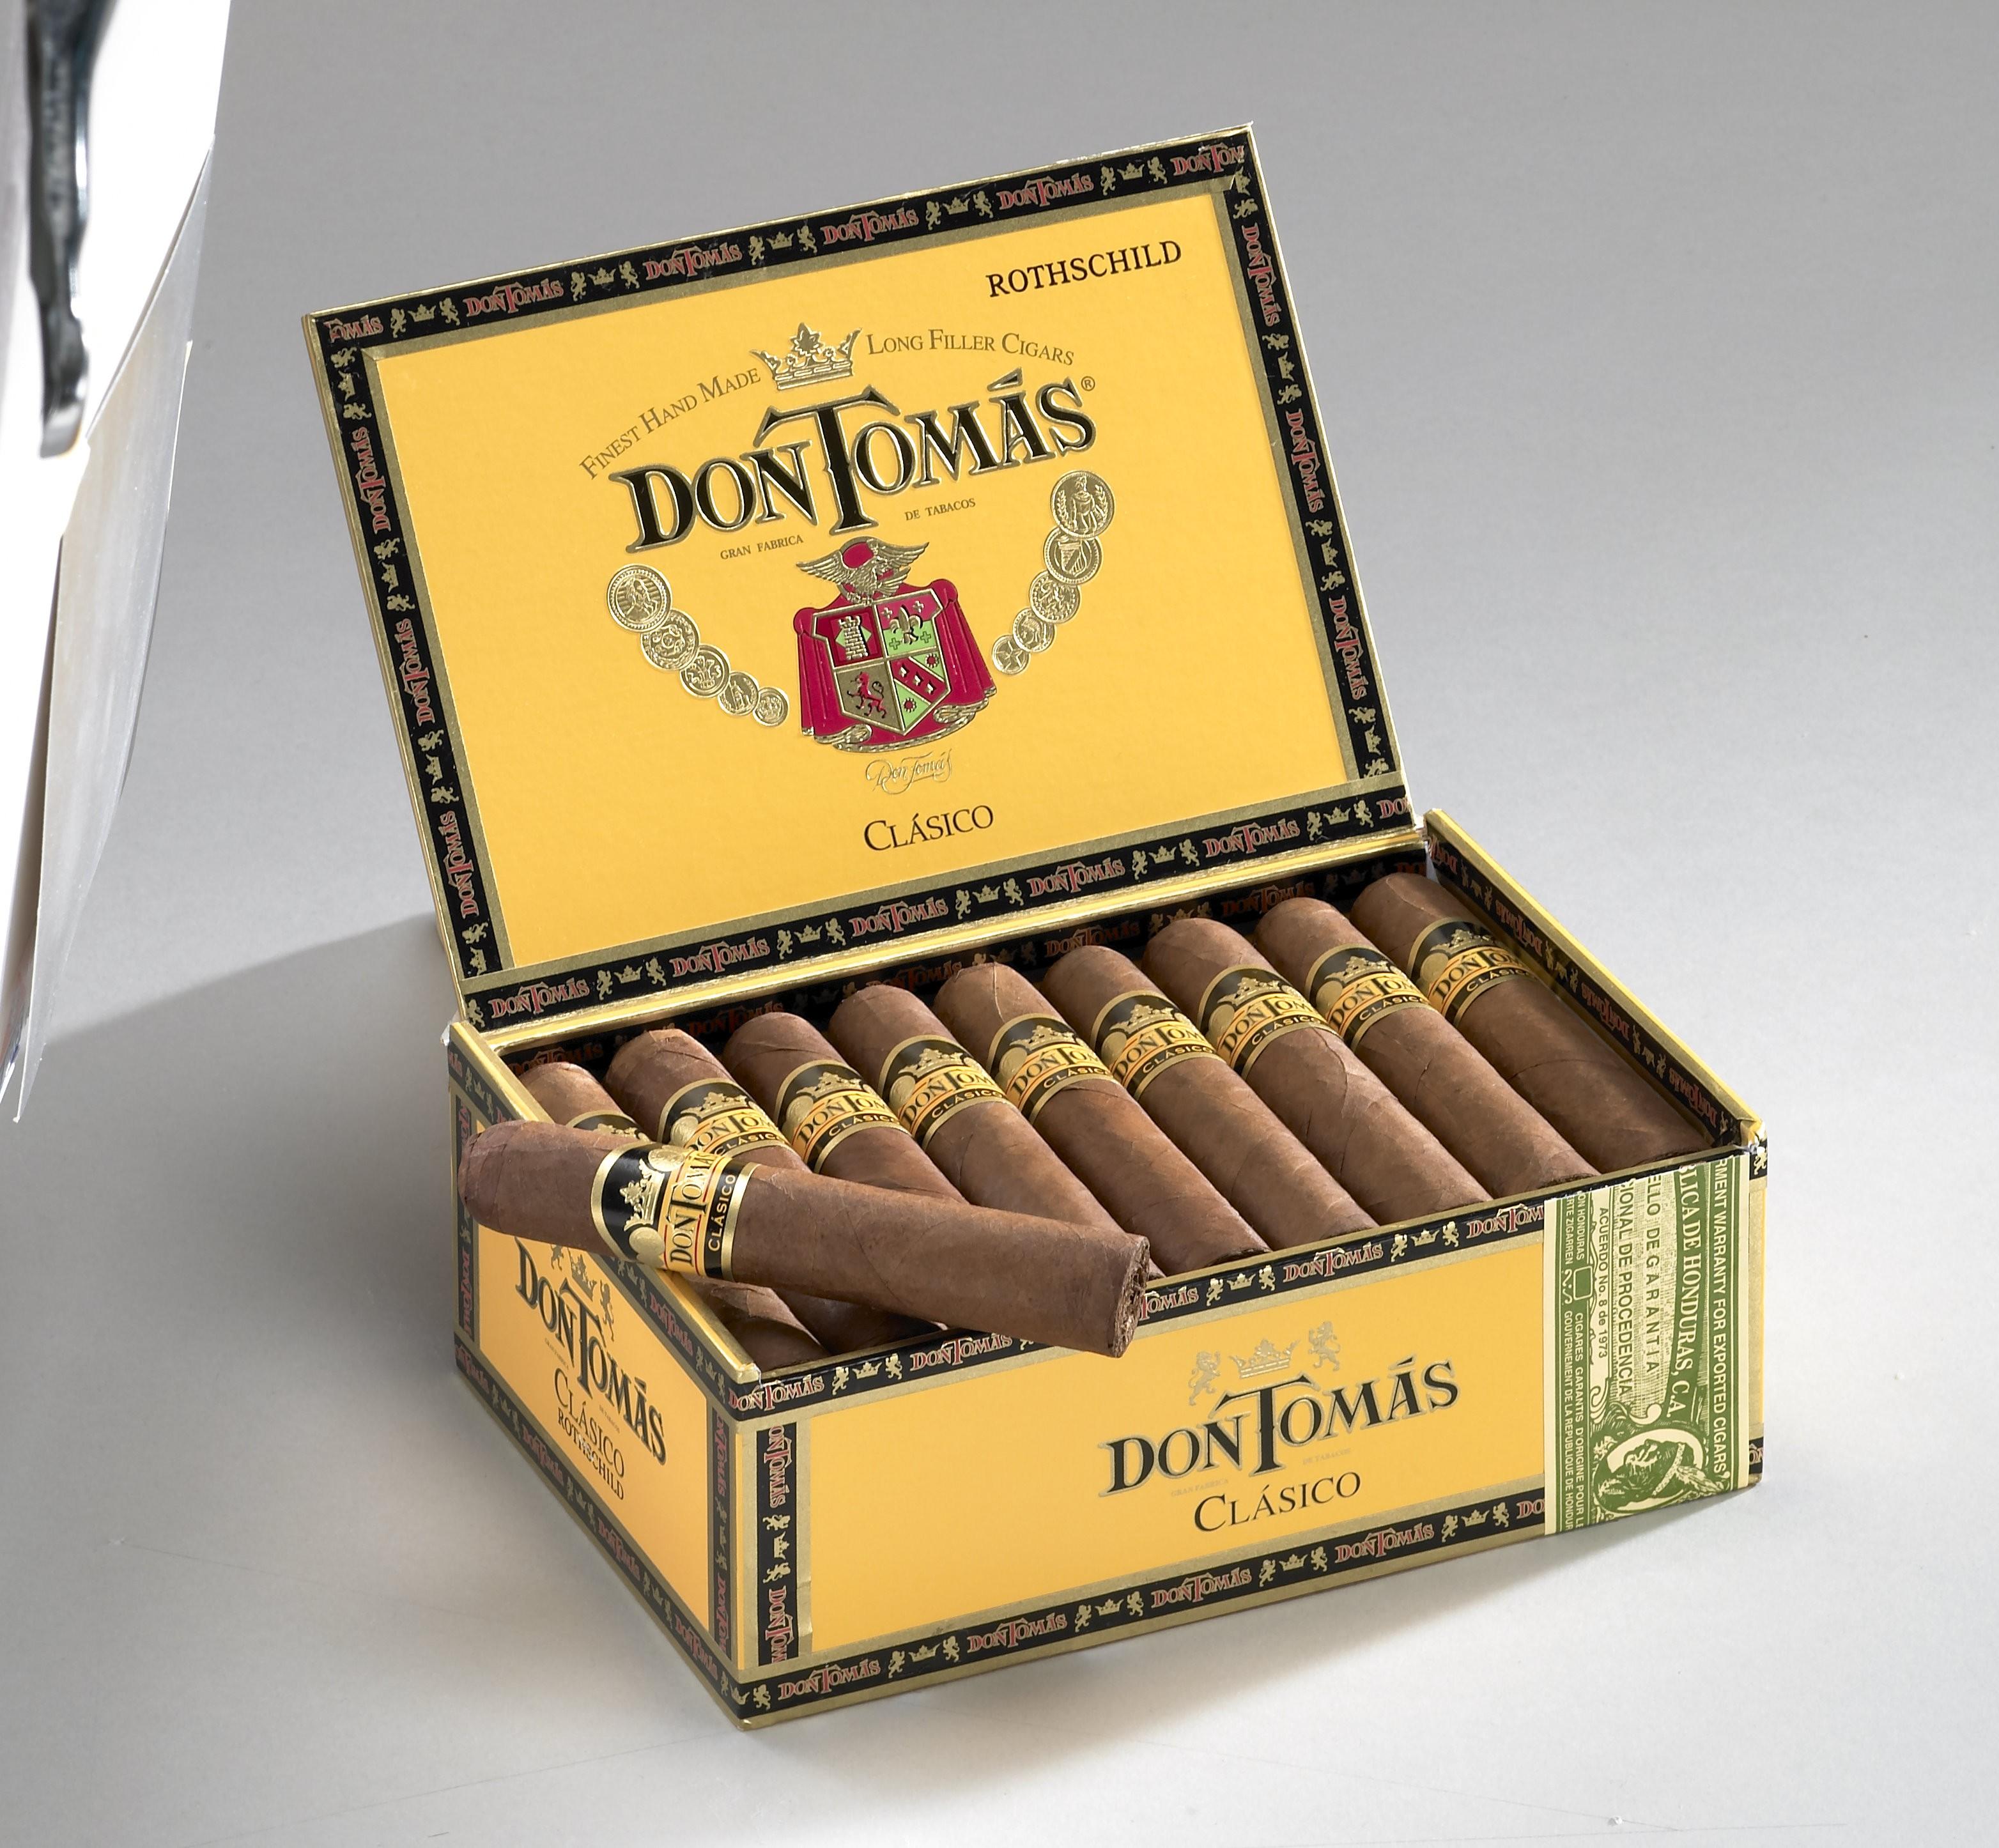 Don Tomas classico Rothschild